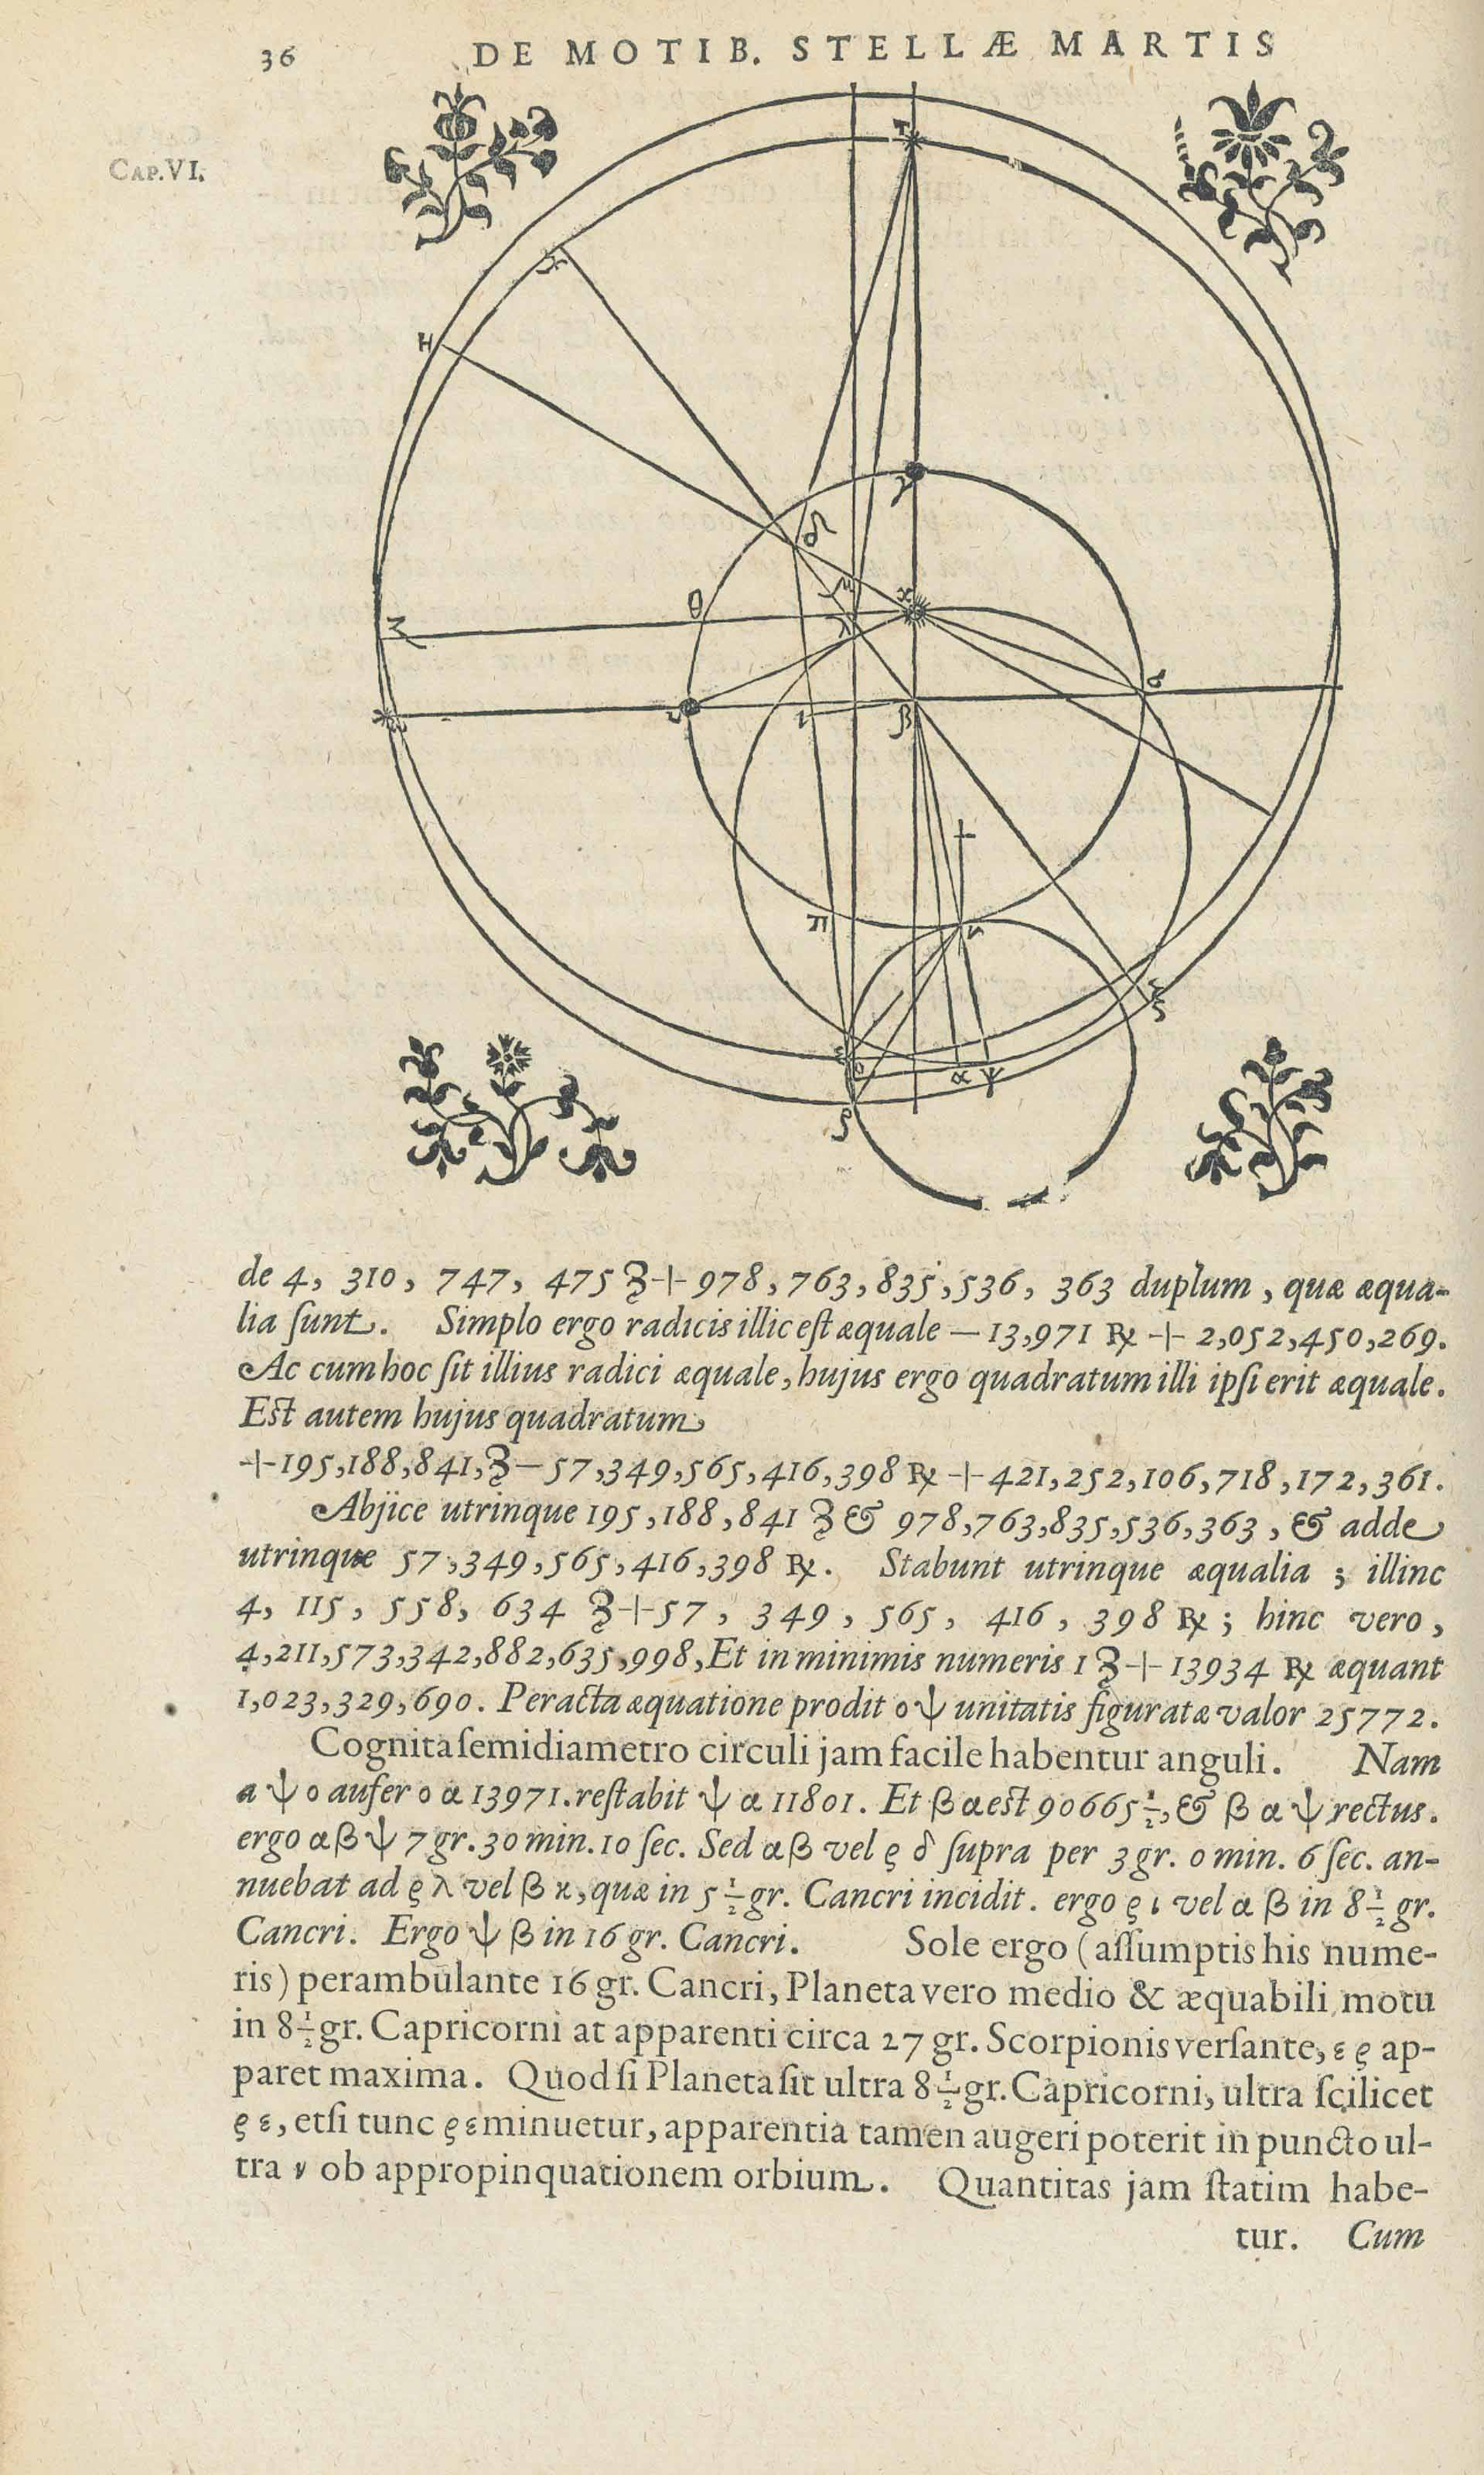 KEPLER, Johannes. Astronomia nova, seu physica coelestis, tradita commentariis de motibus stellae Martis, ex observationibus G.V. Tychonis Brahe. [Heidelberg: E. Vögelin,] 1609.